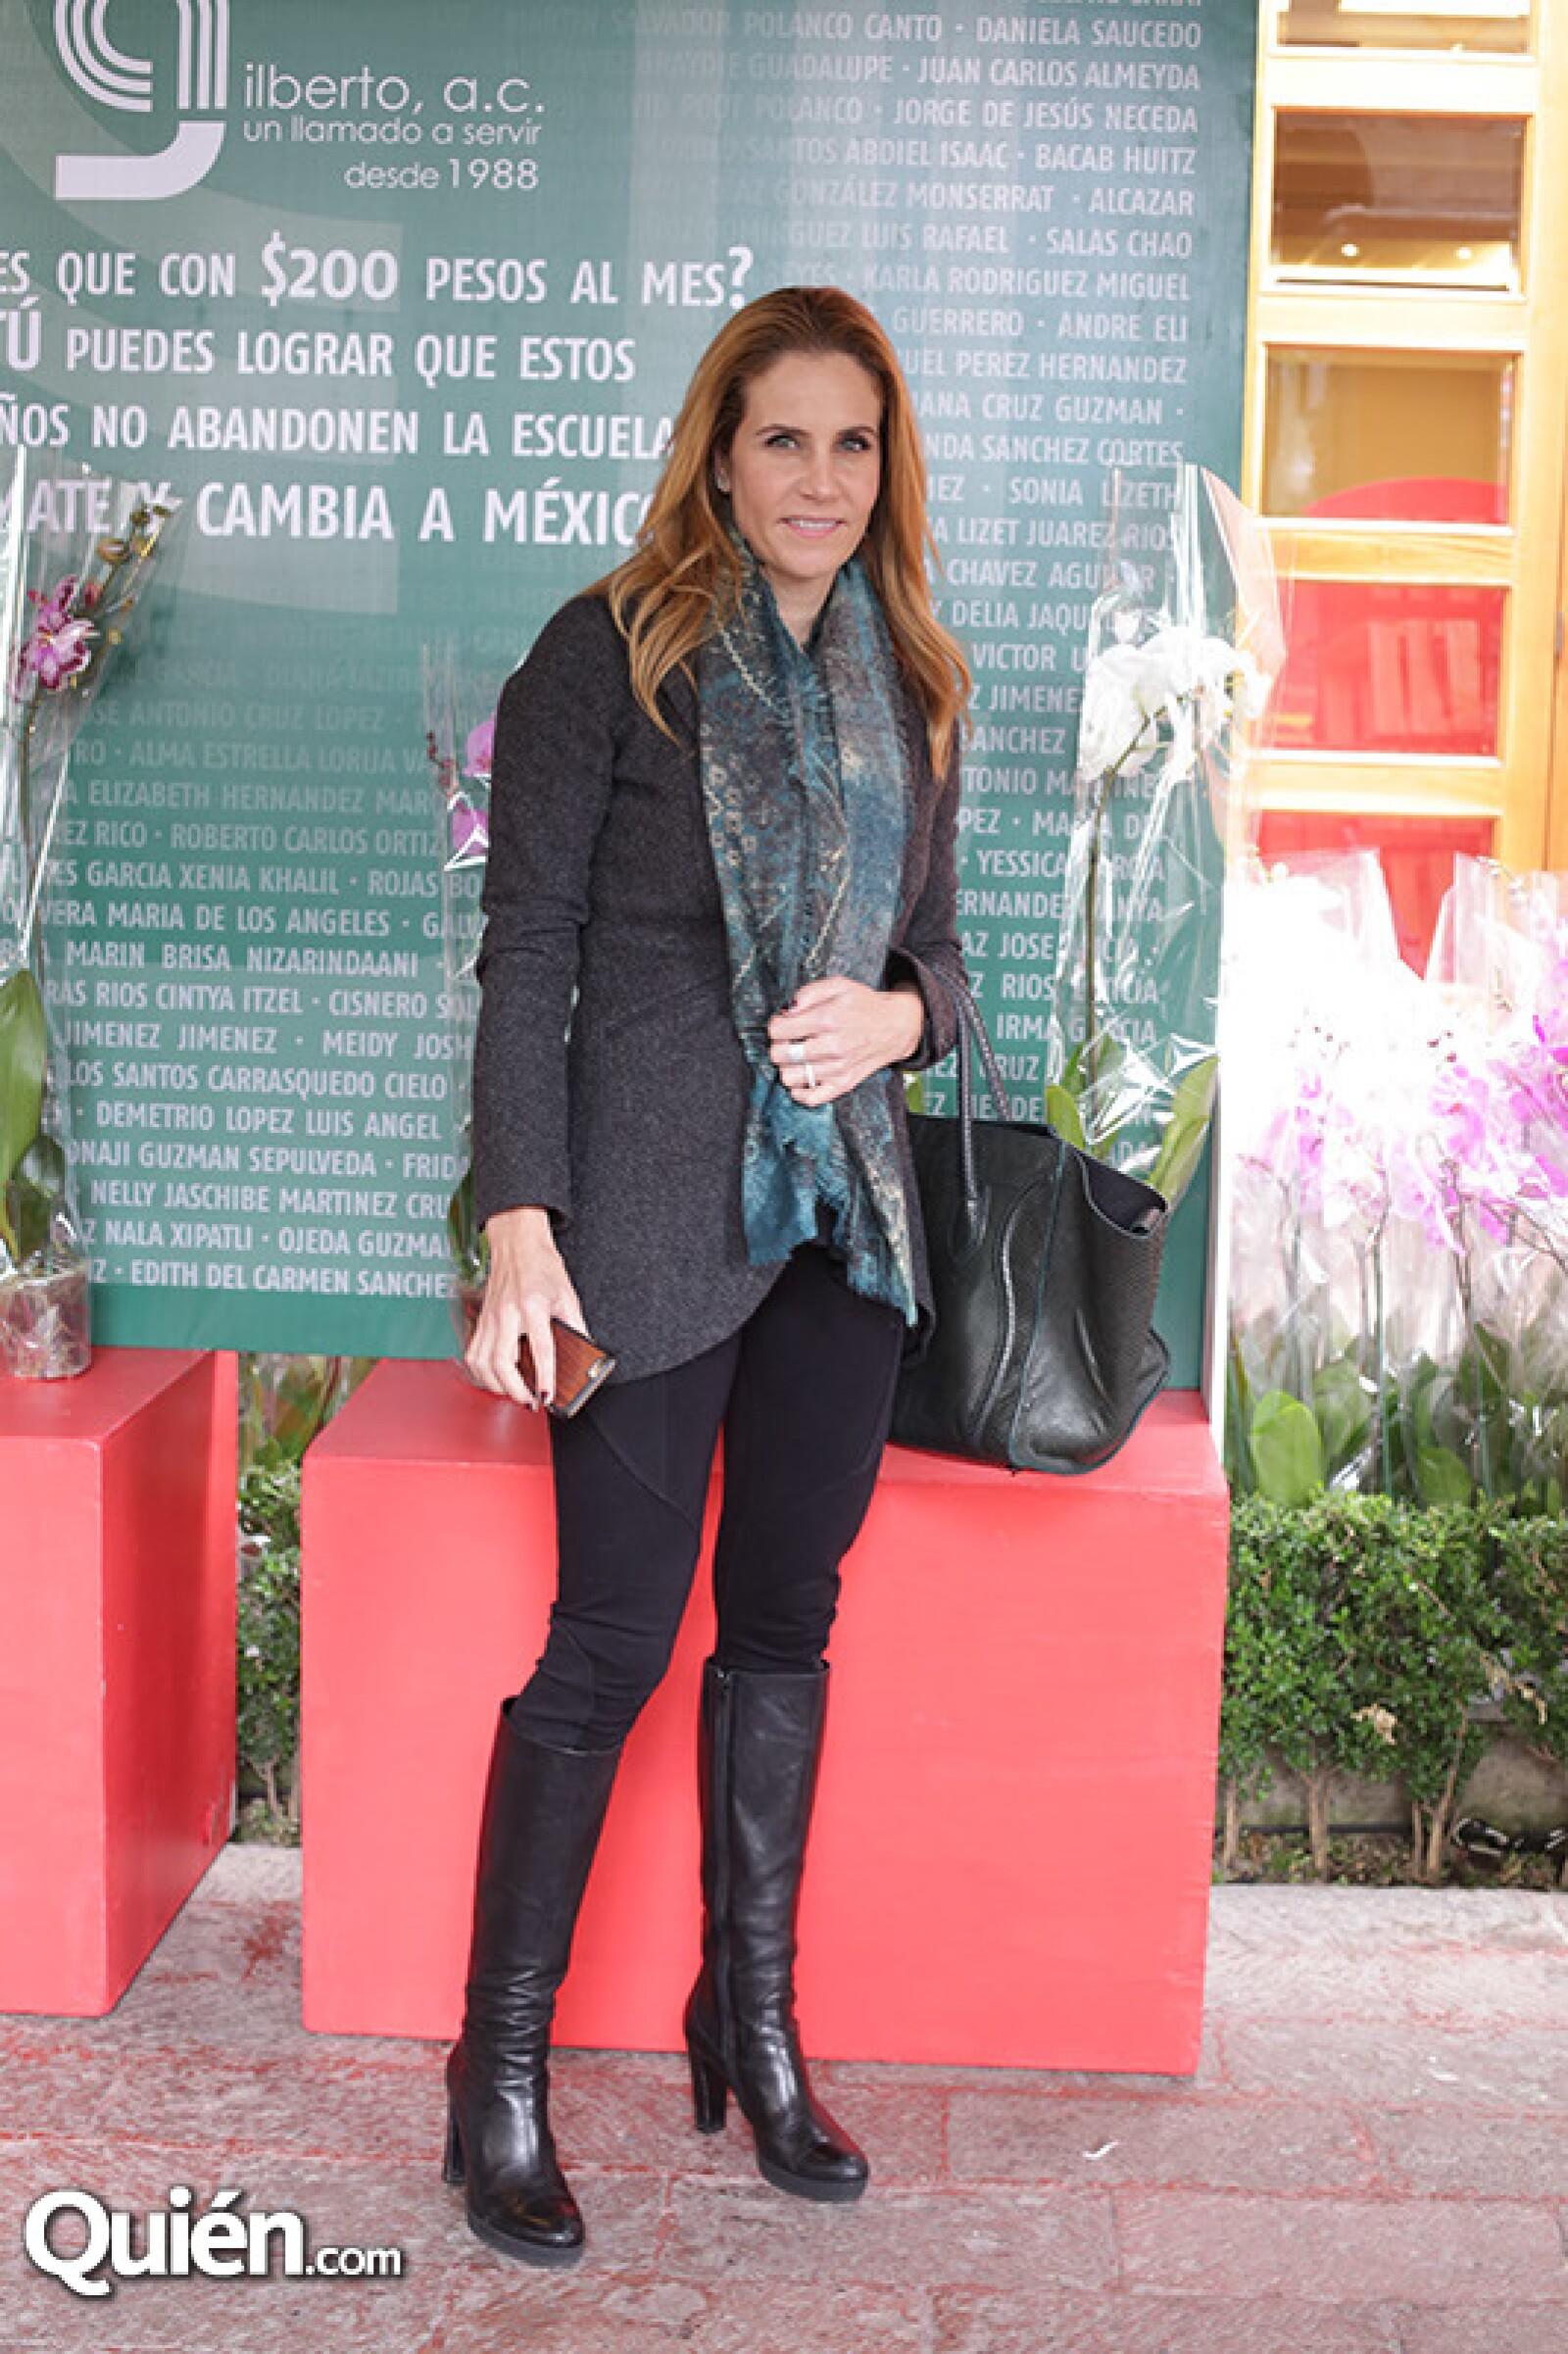 Roberta Cannizzo